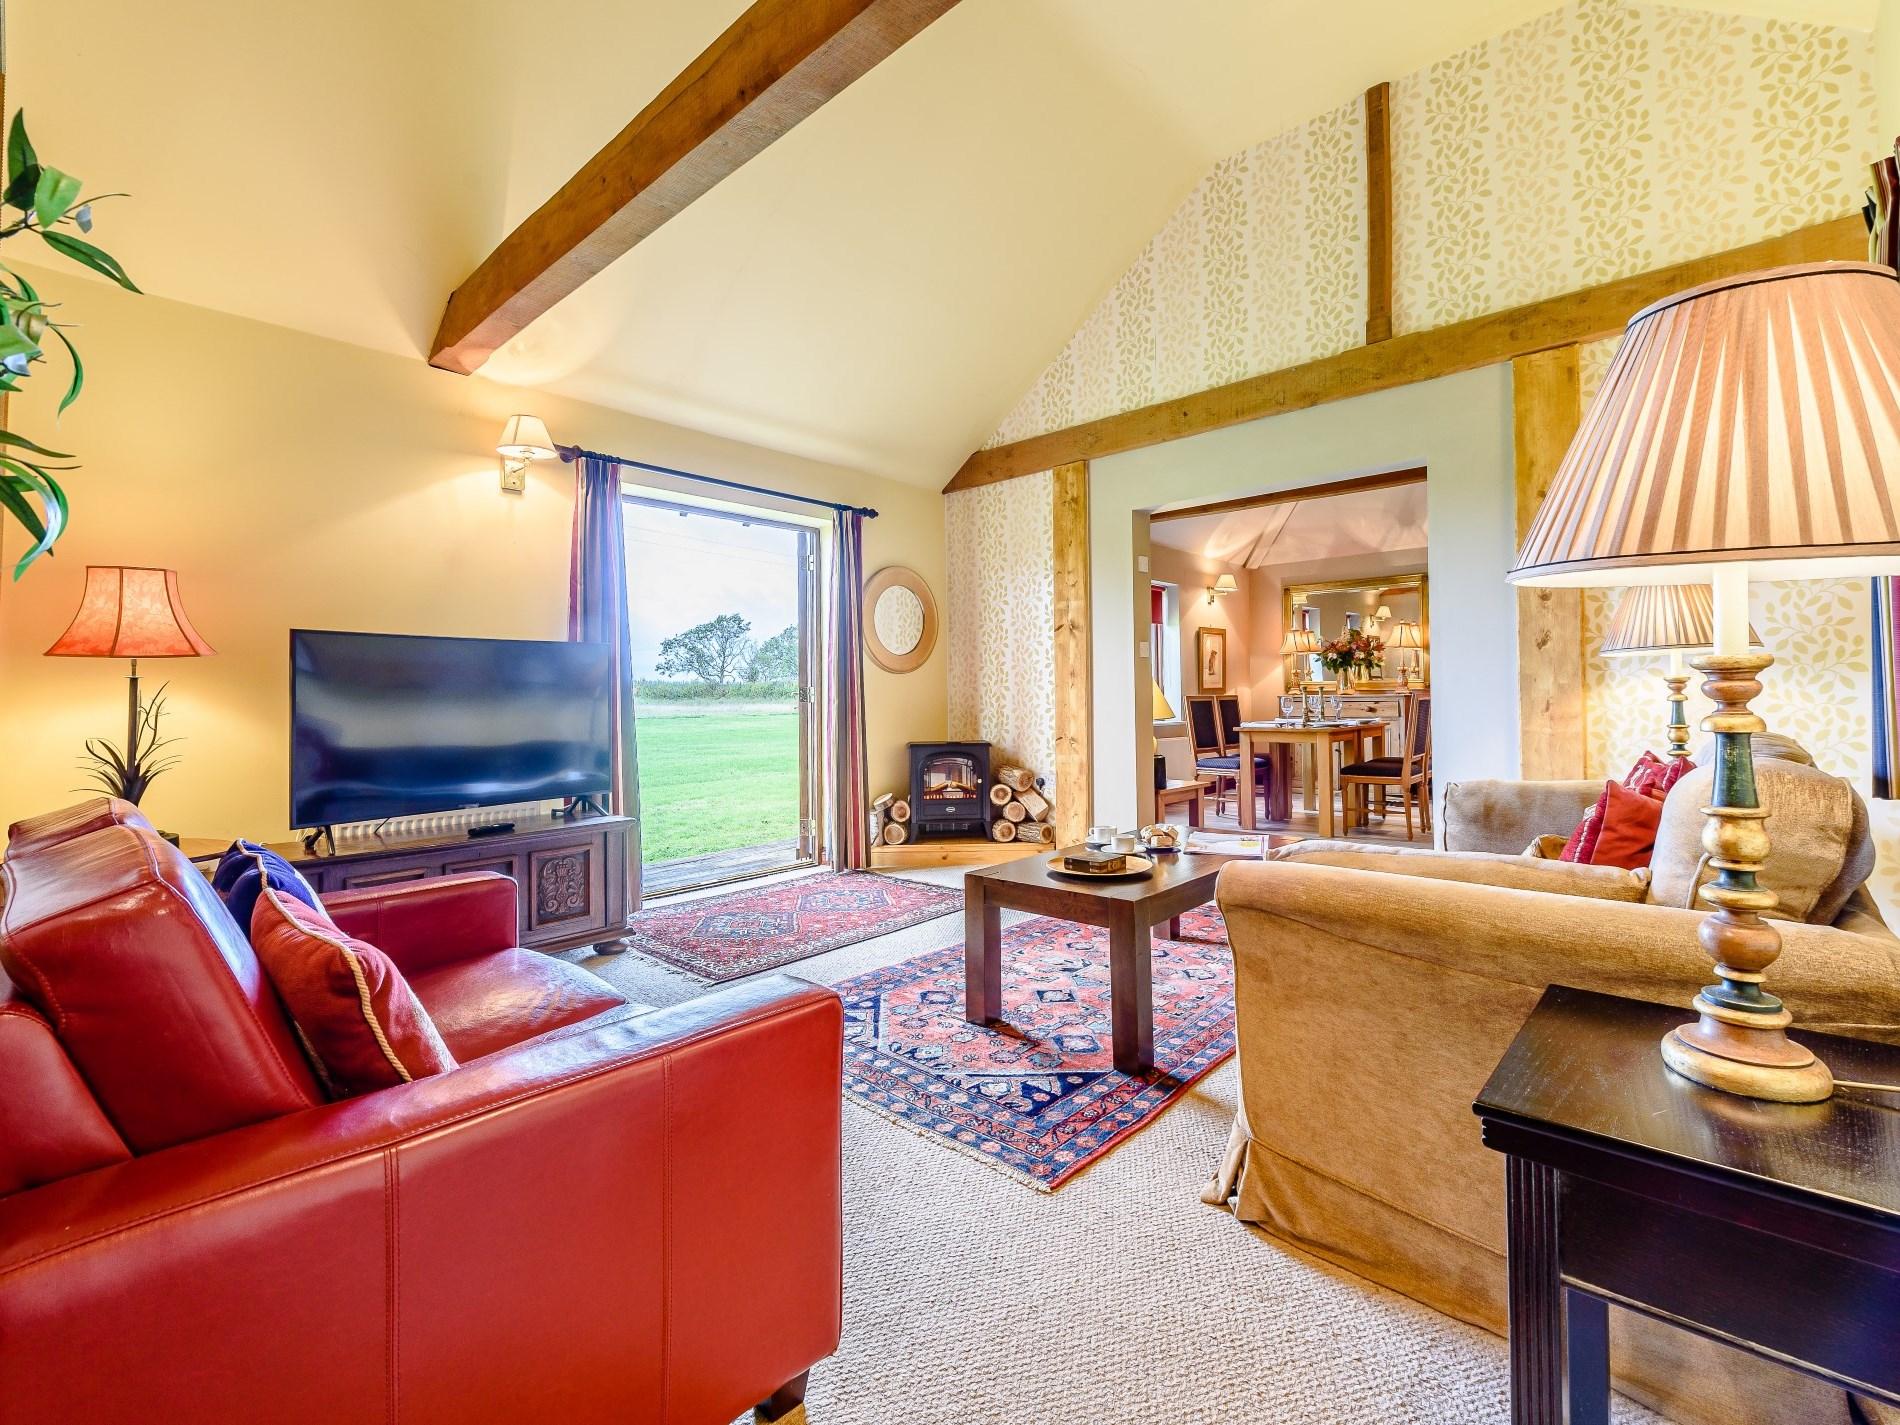 2 Bedroom Cottage in Bedford, East of England